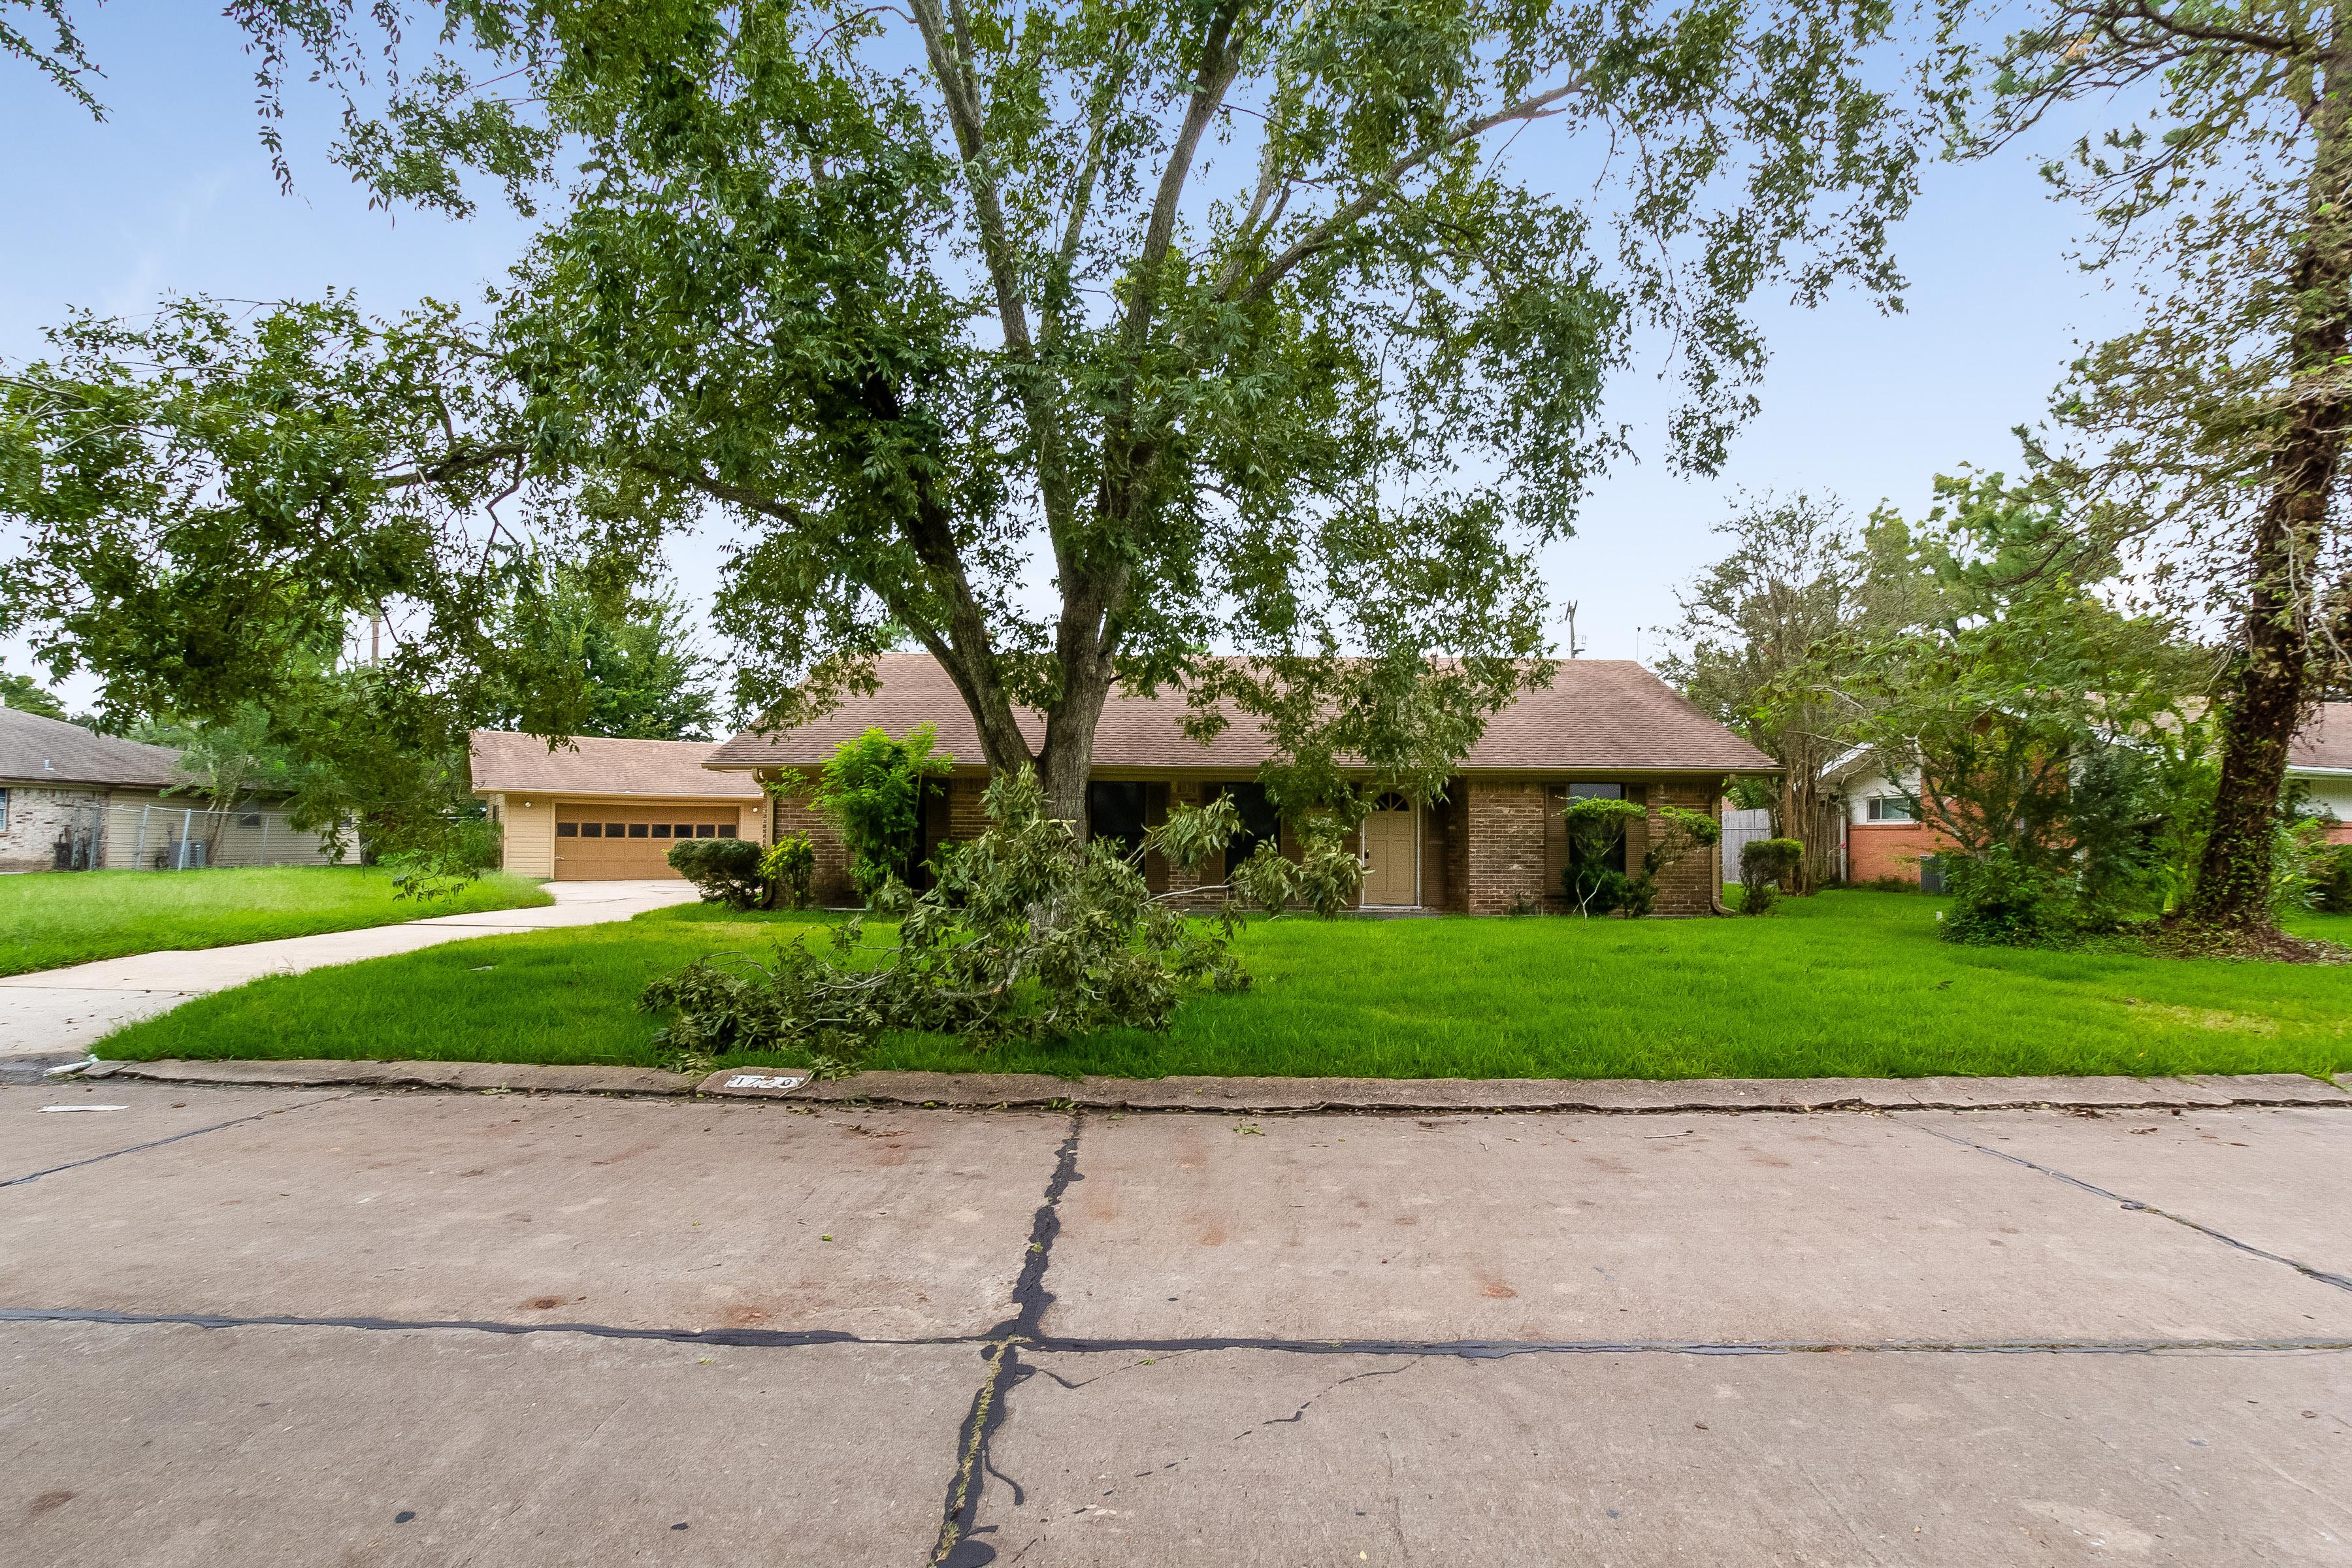 Photo of 1728 Glenview Drive, Alvin, TX, 77511